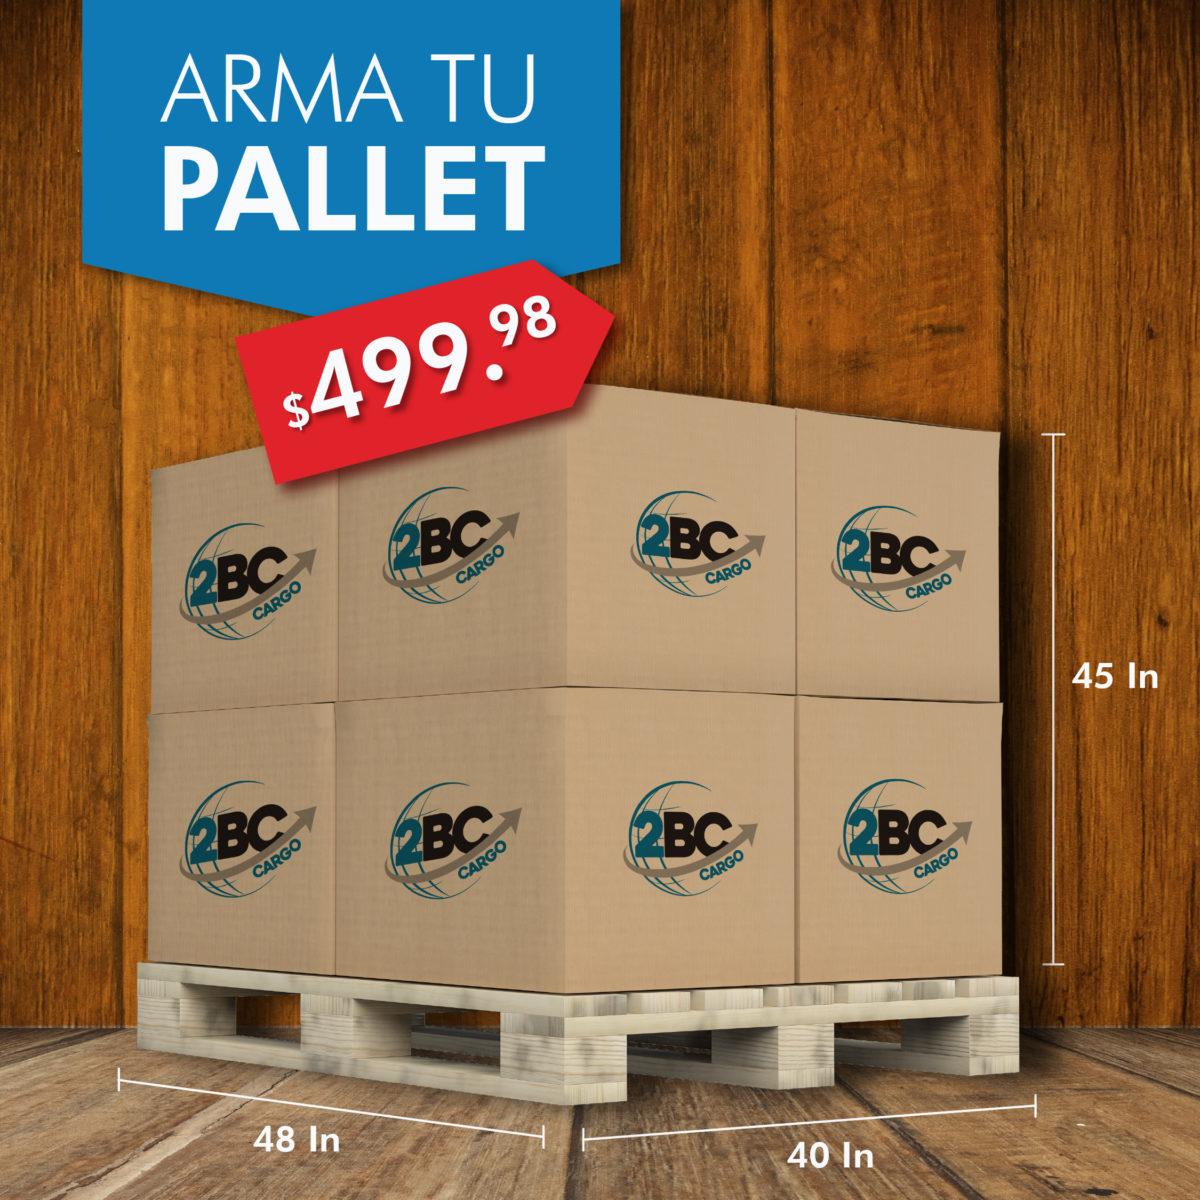 promo-pallet-1200x1200.jpg